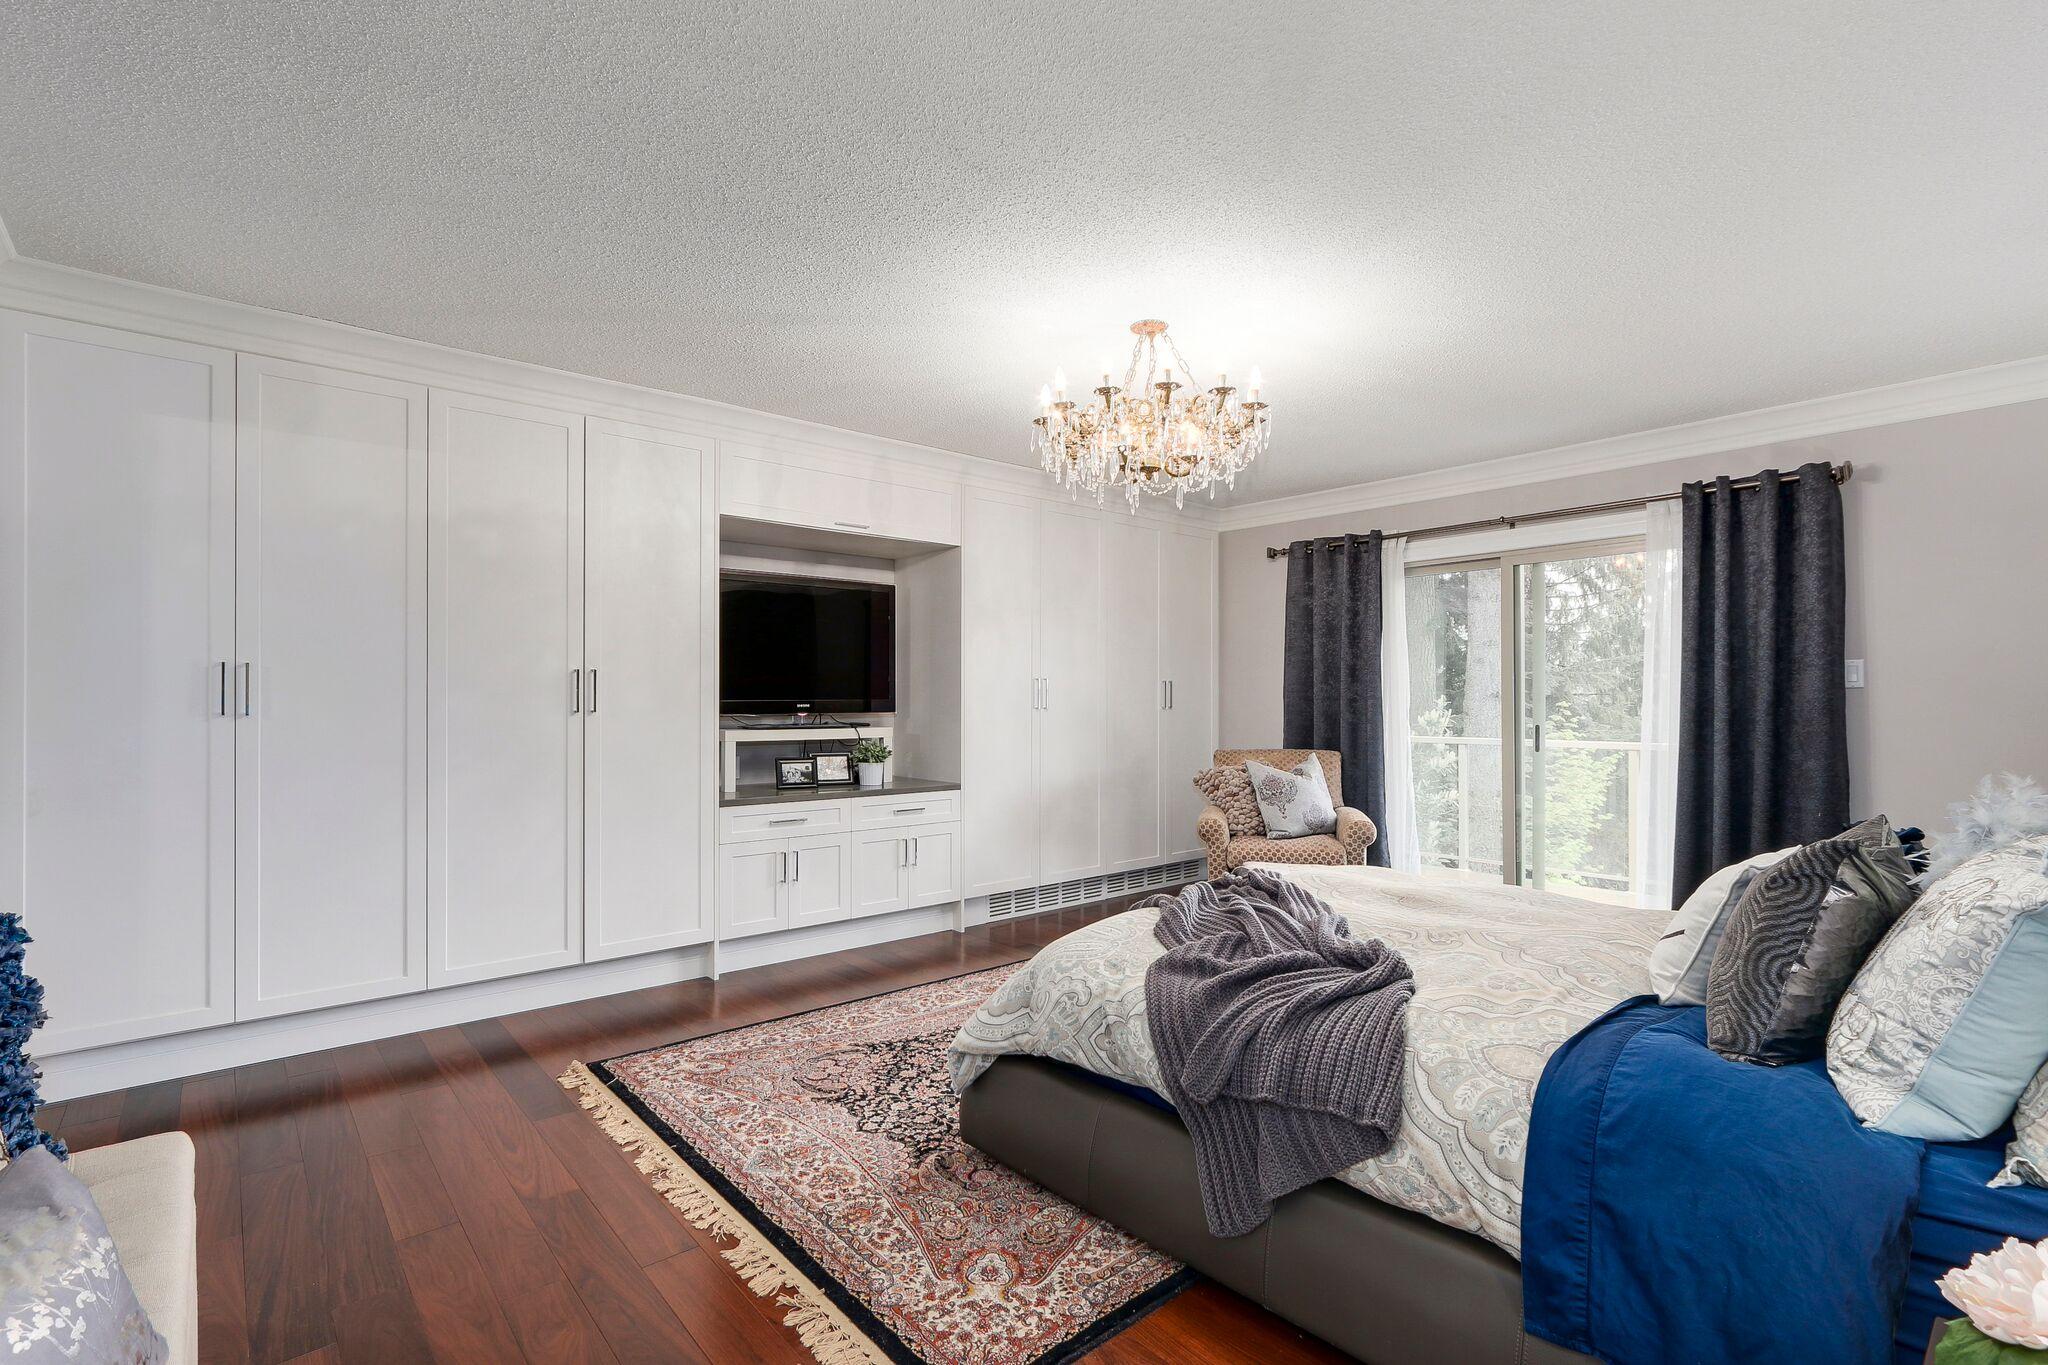 Luxury Master Bedroom Renovation in Coquitlam